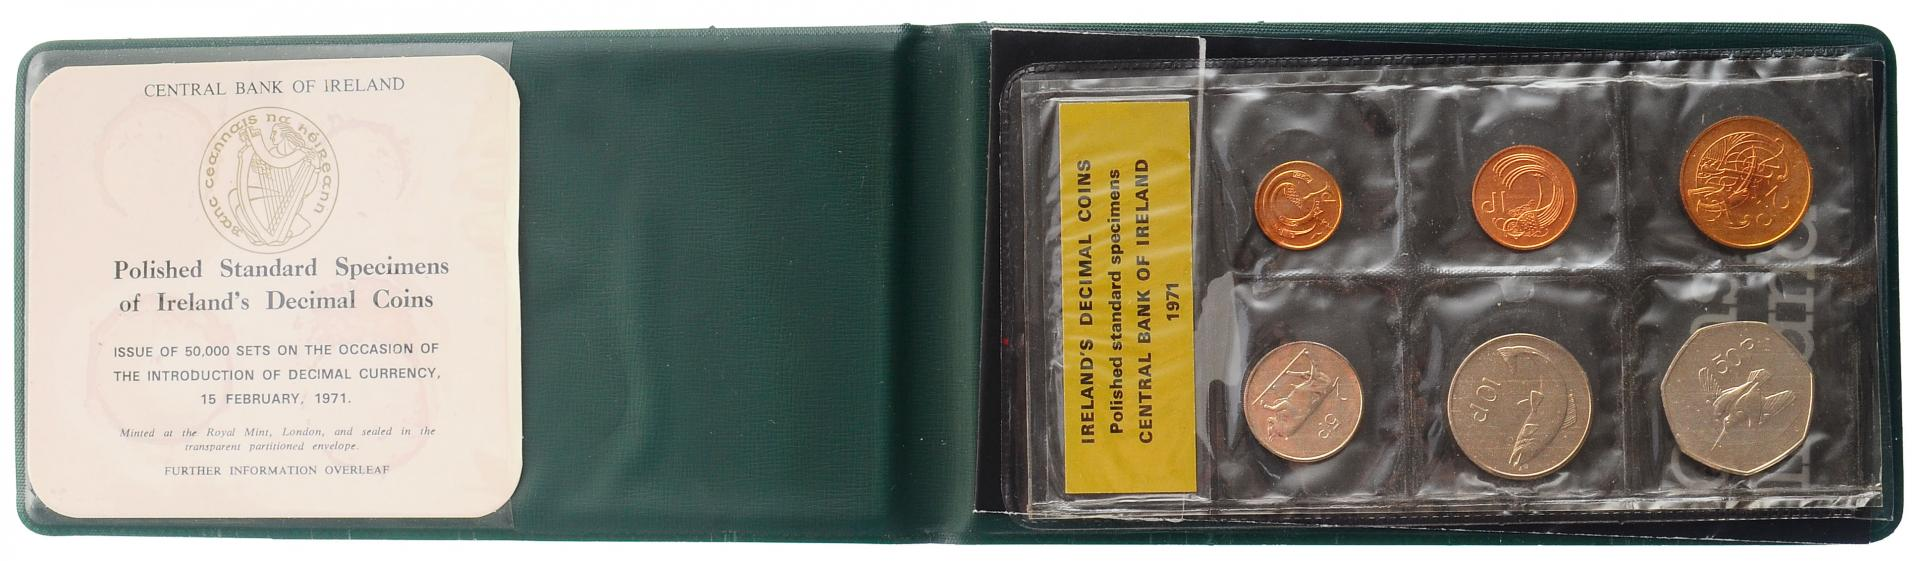 Ирландия набор монет 1971 года в буклете